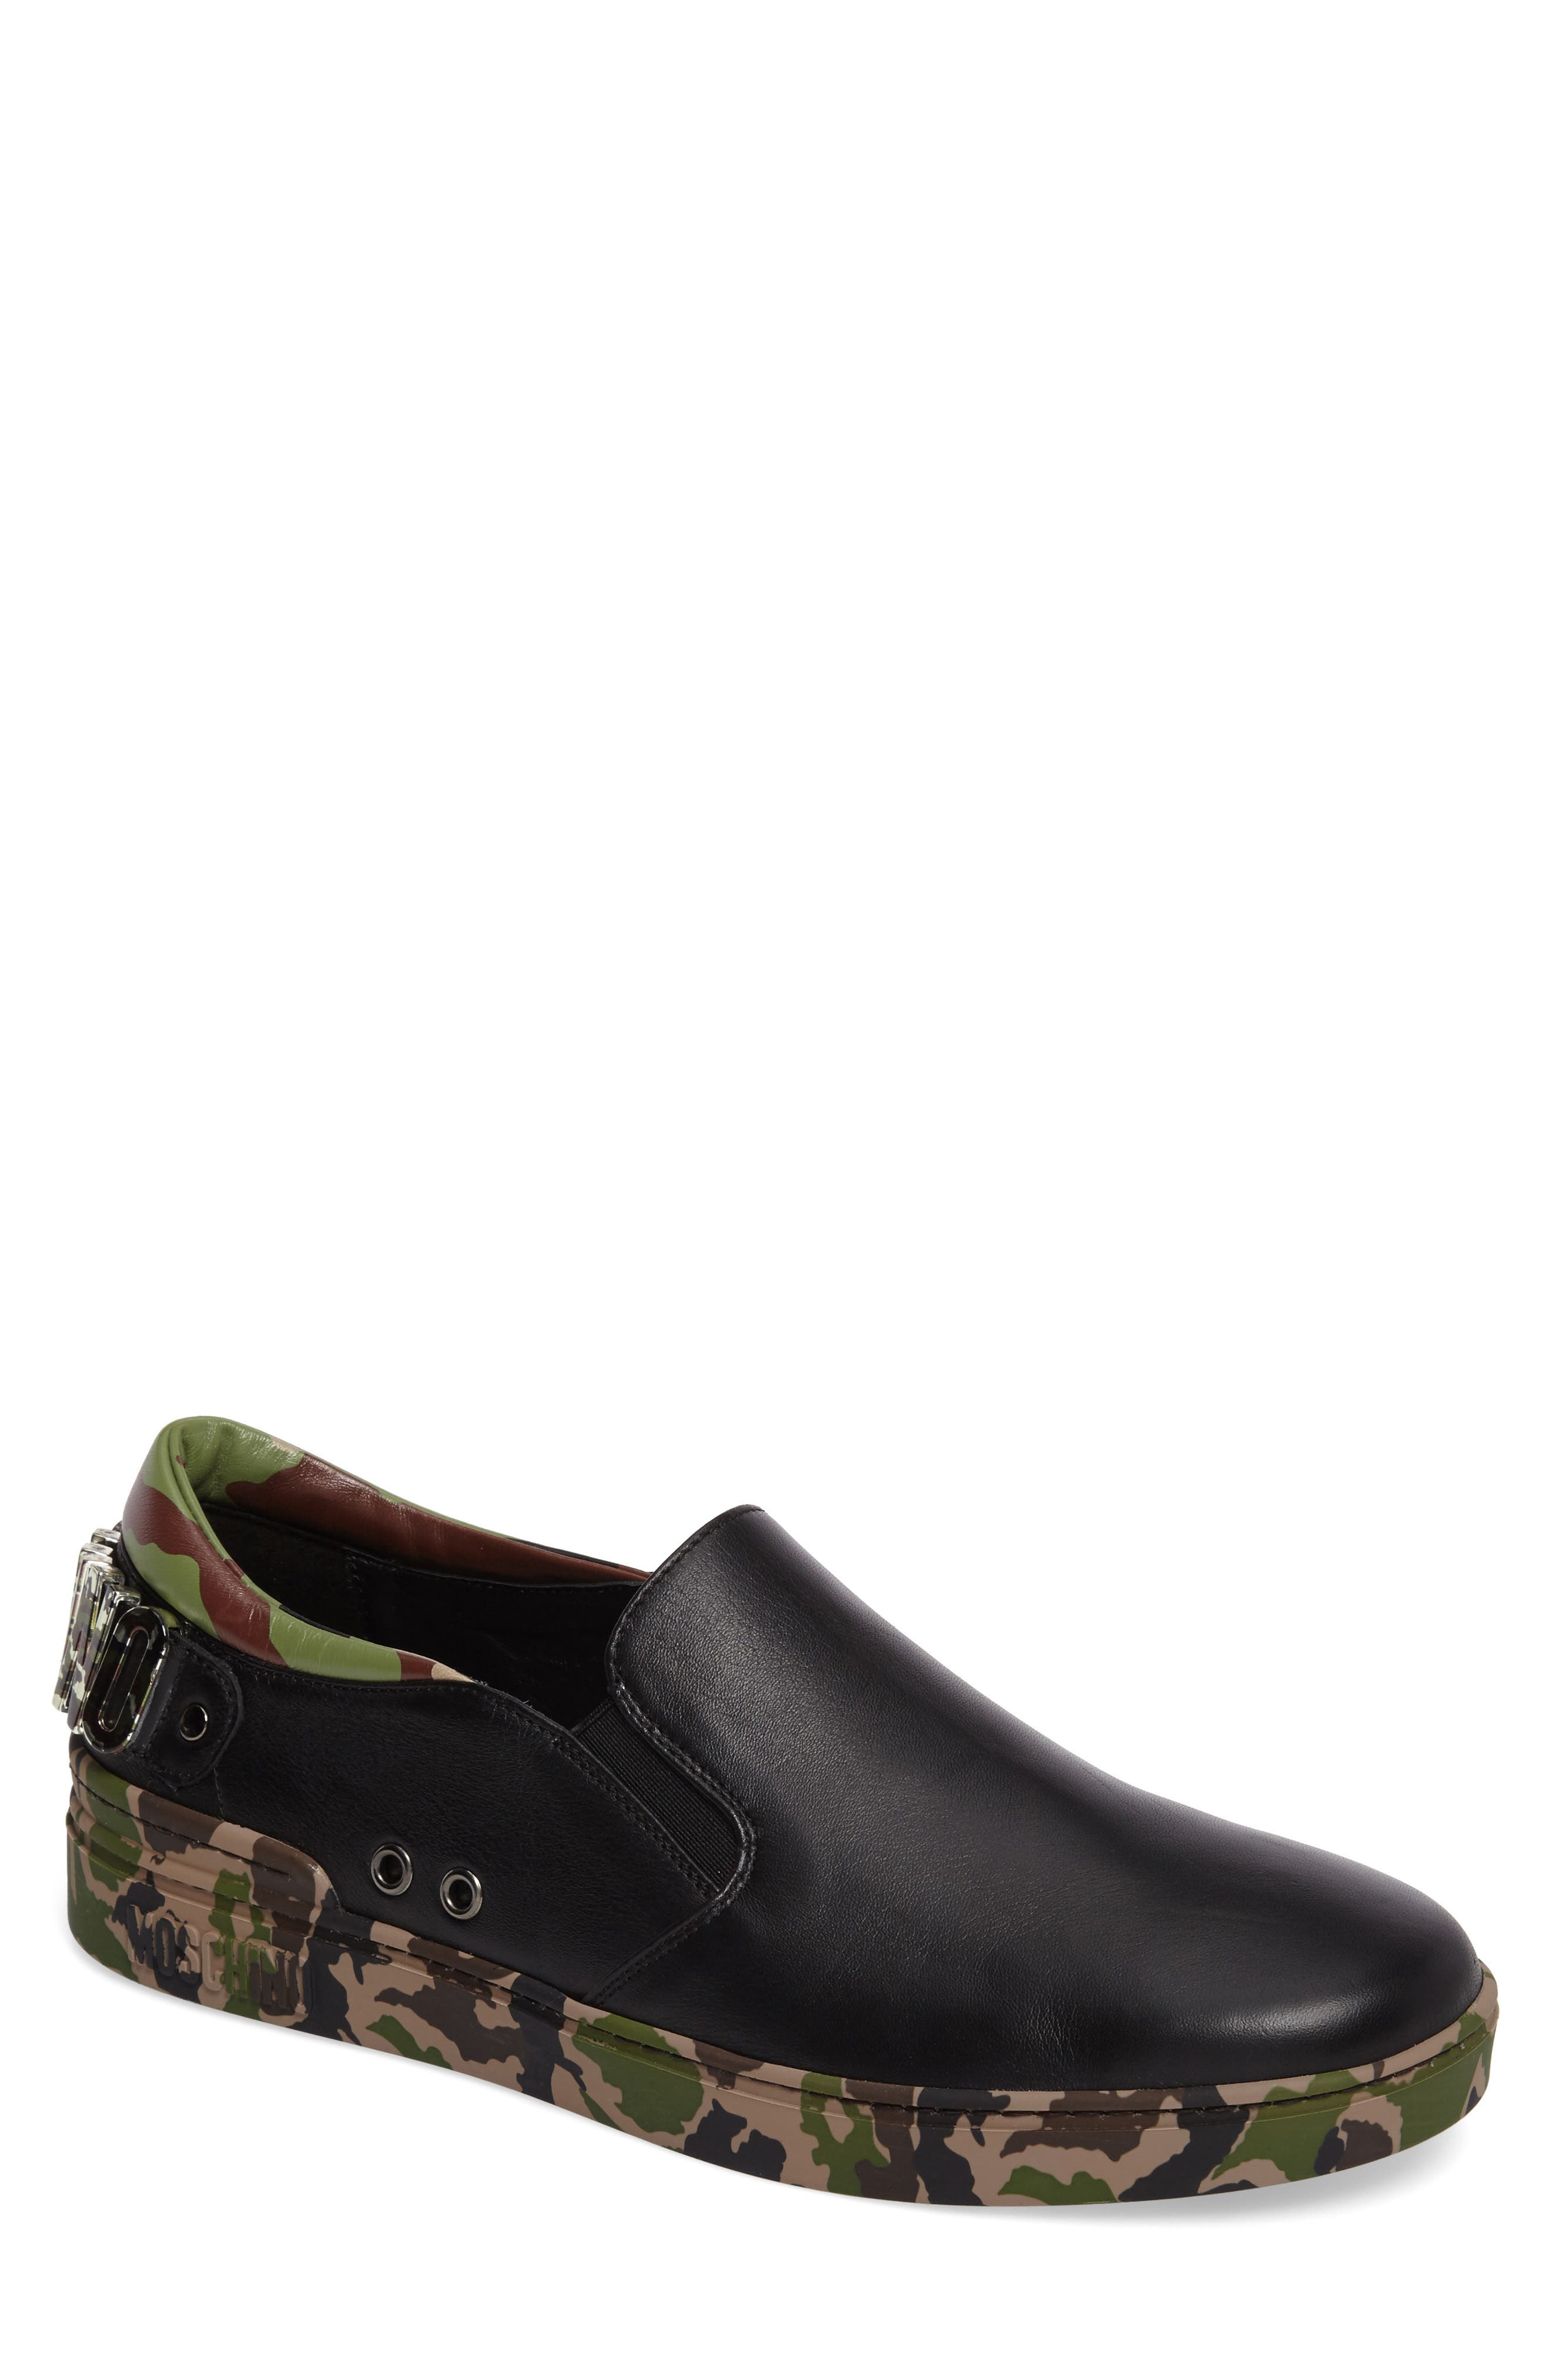 Moschino Camo Slip-On Sneaker (Men)